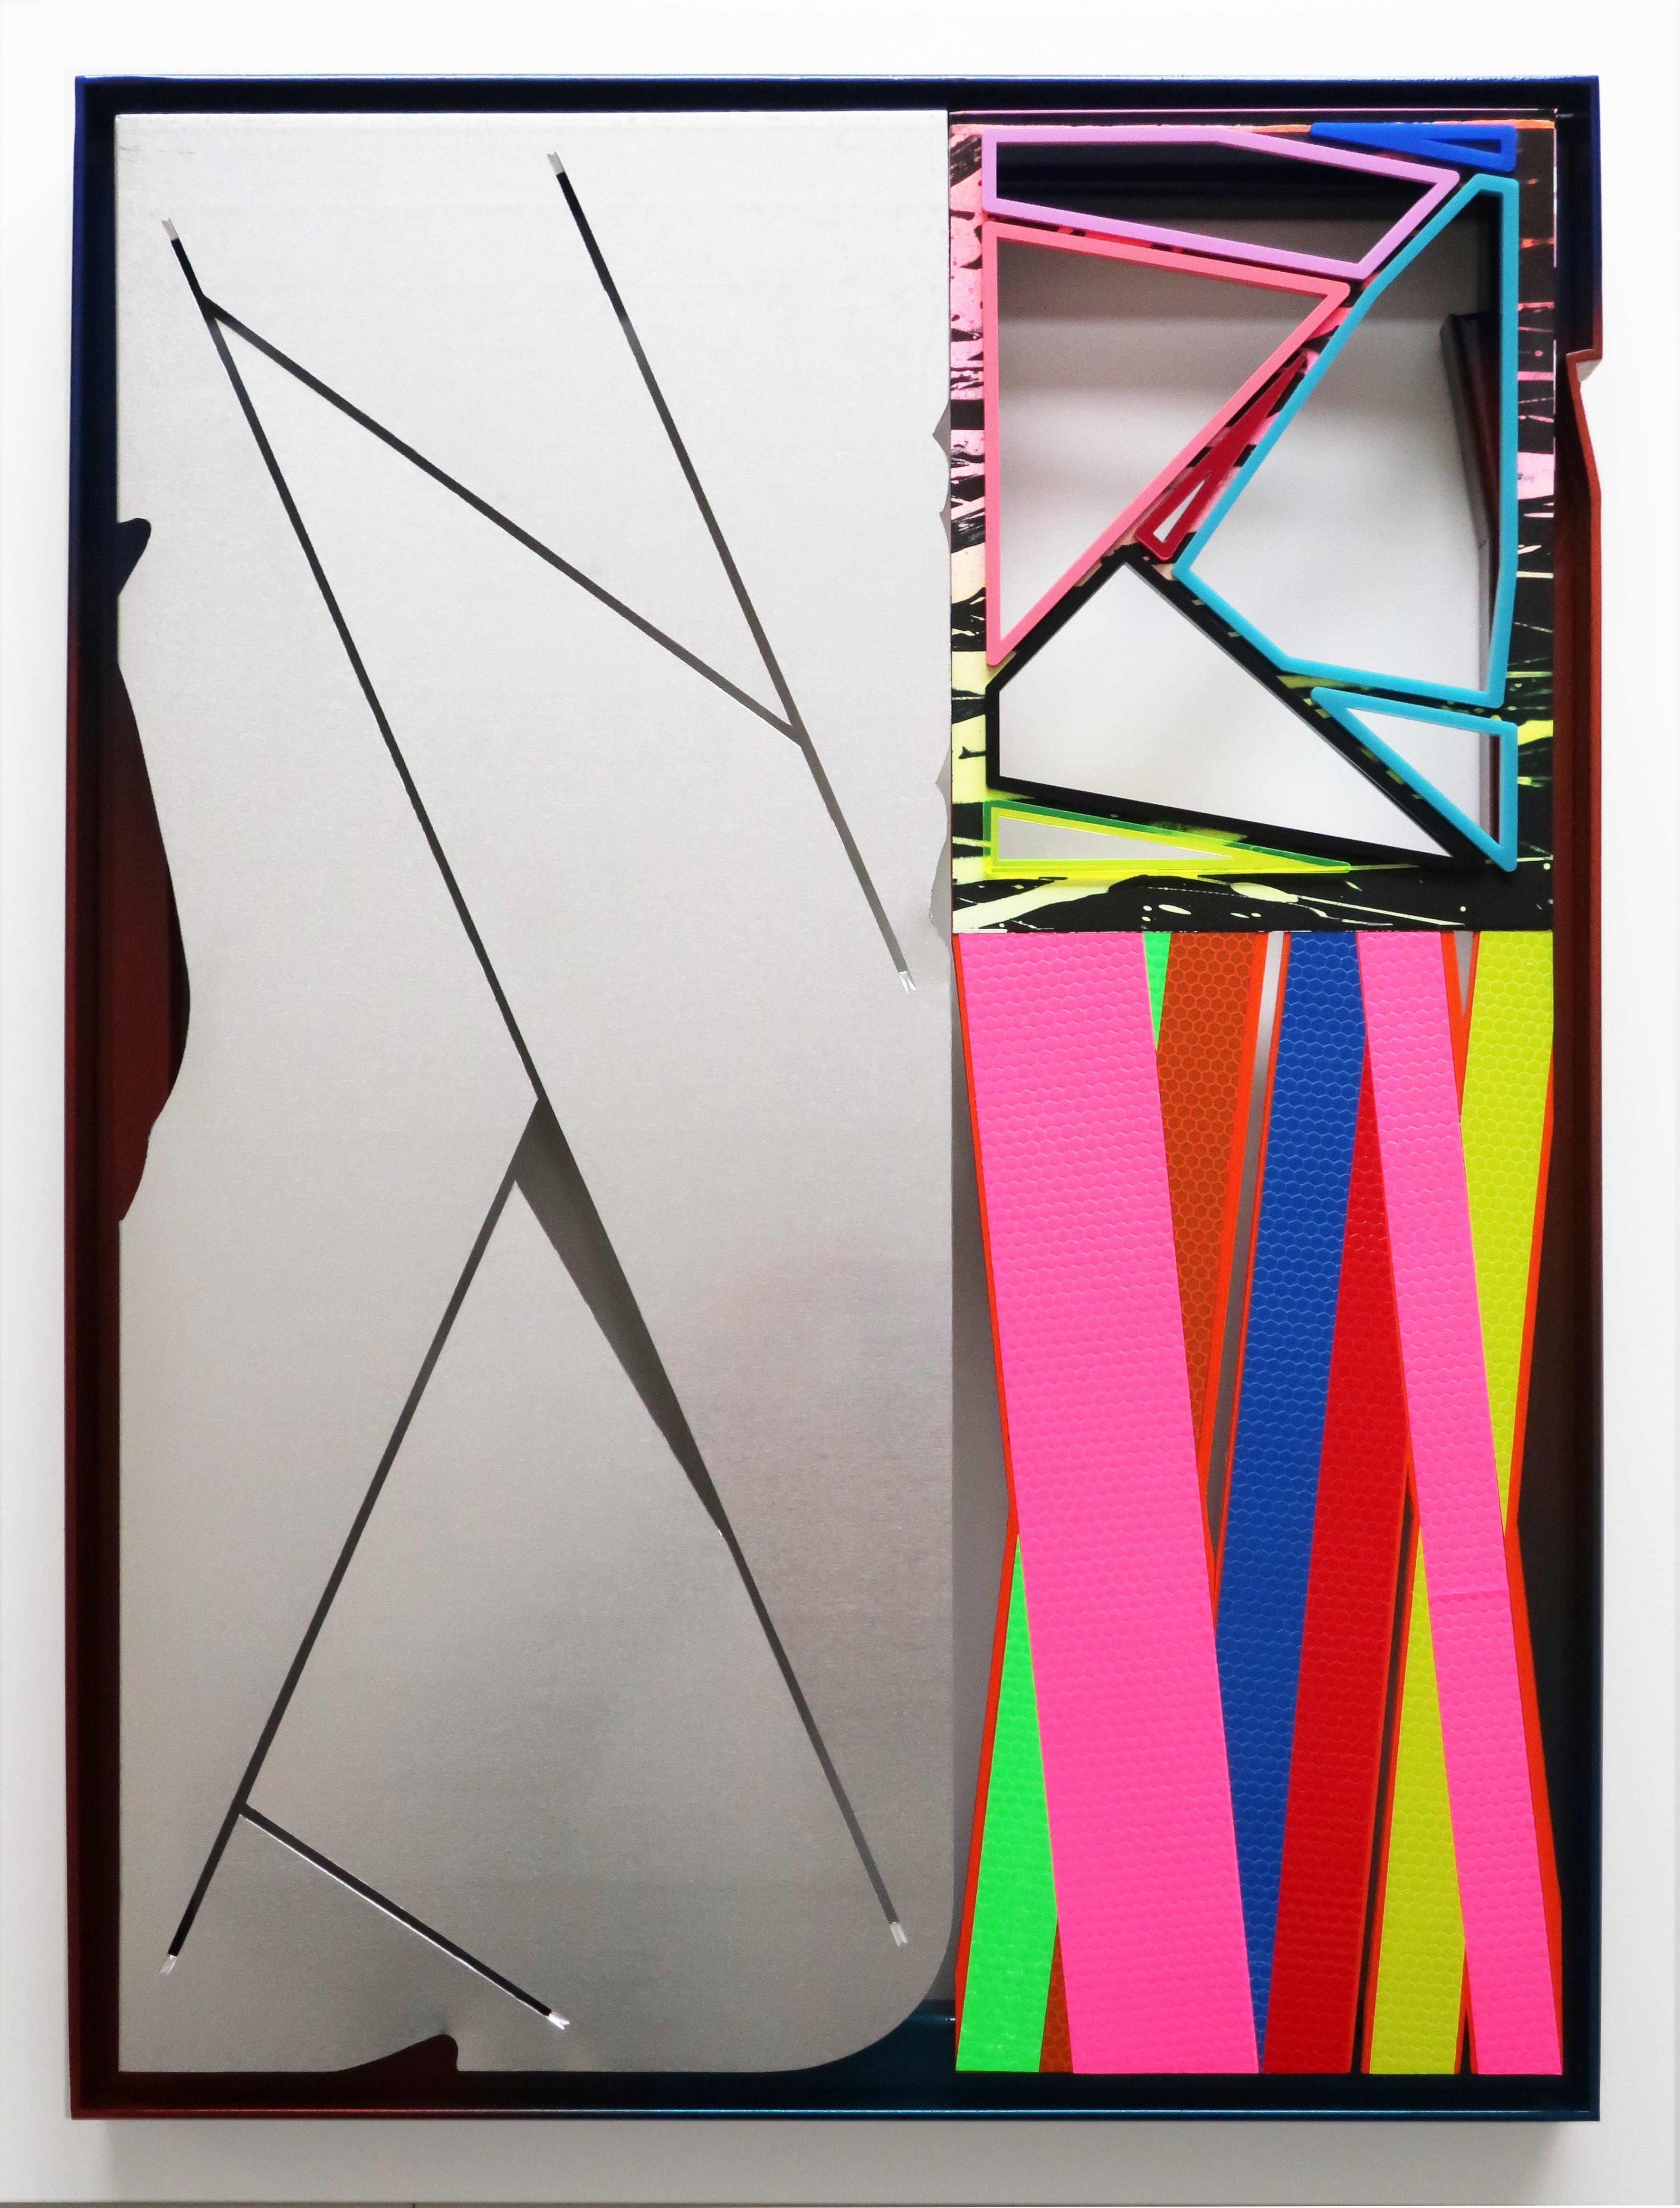 NemesM_Police-Party-03_2019_55x40cm_steel-aluminium-foamex-PVC-lasercut-perspex-light-reflective-vinyl-mirror-paper-acrylic-carpaint-min